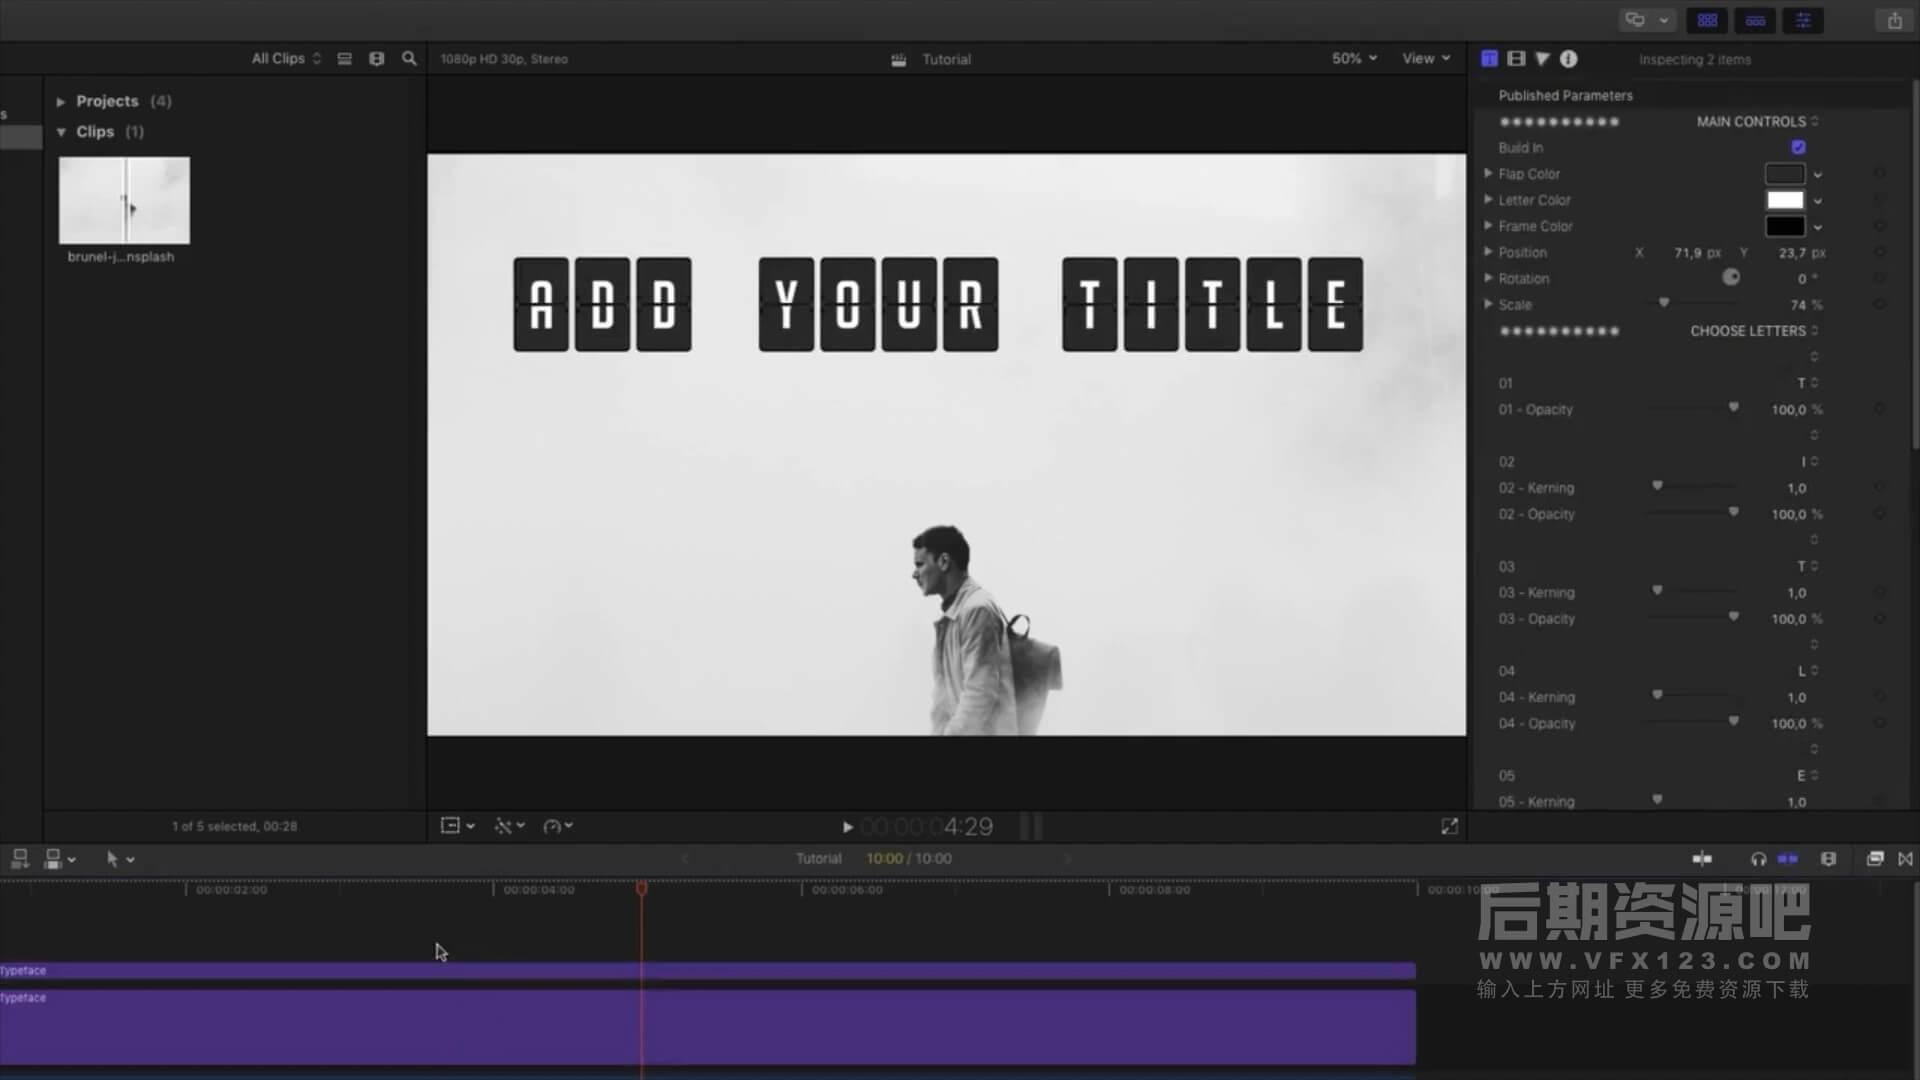 fcpx标题插件 文字翻页跳板动画模板 Flip Board Animated Typeface